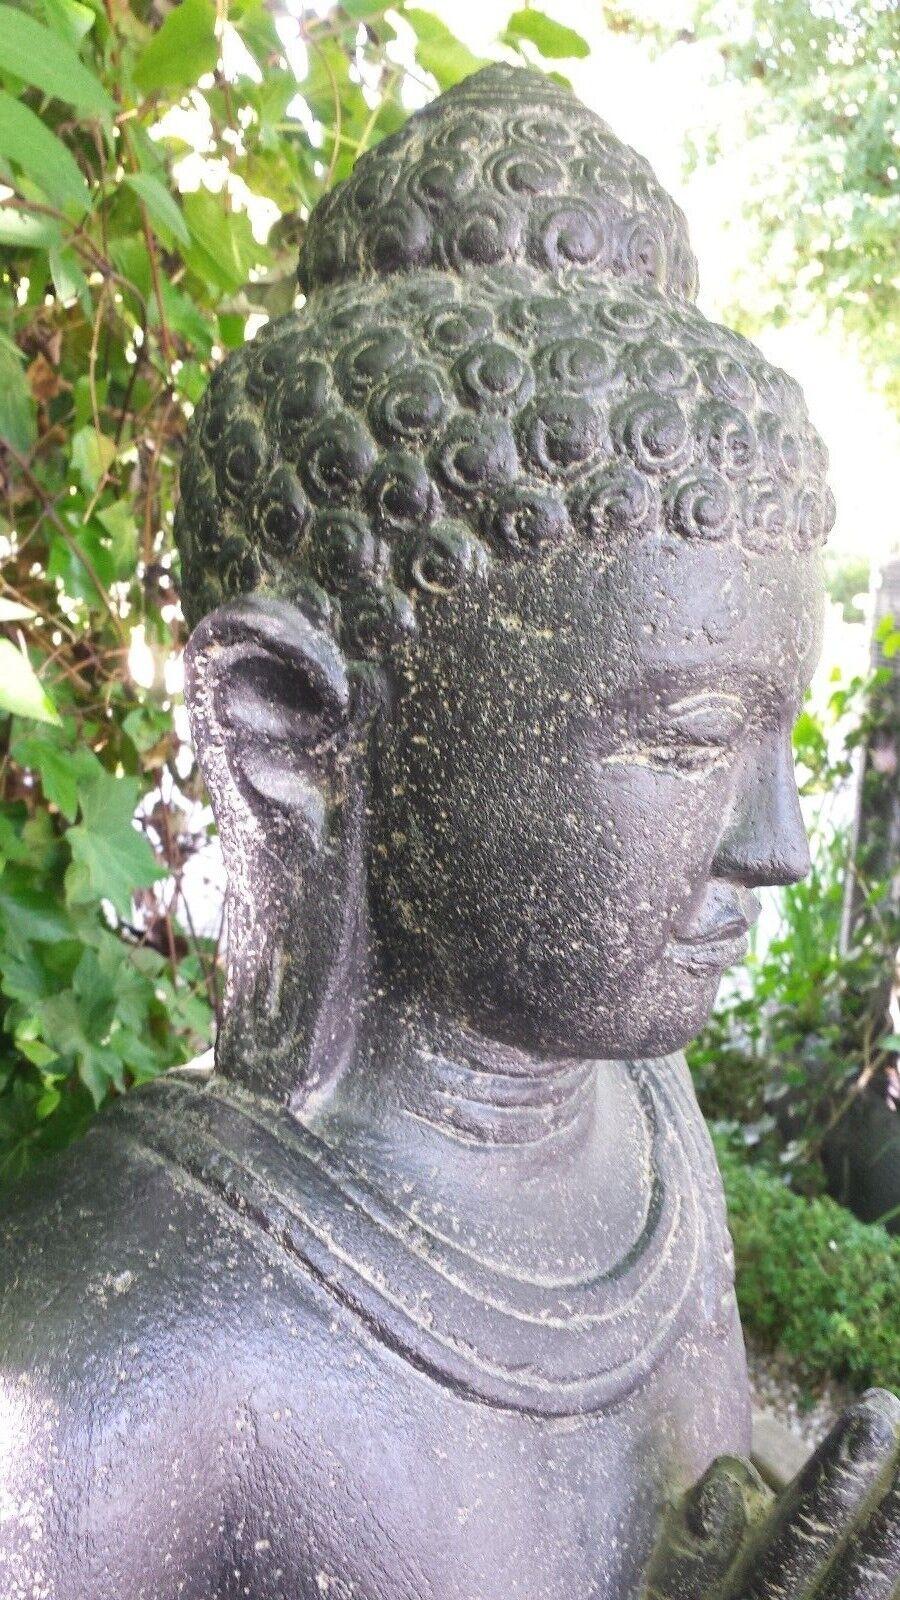 Buddha grüßend Indonesien Lavastein Skulptur Statue Feng Shui Garten Garten Garten Deko c1f75e